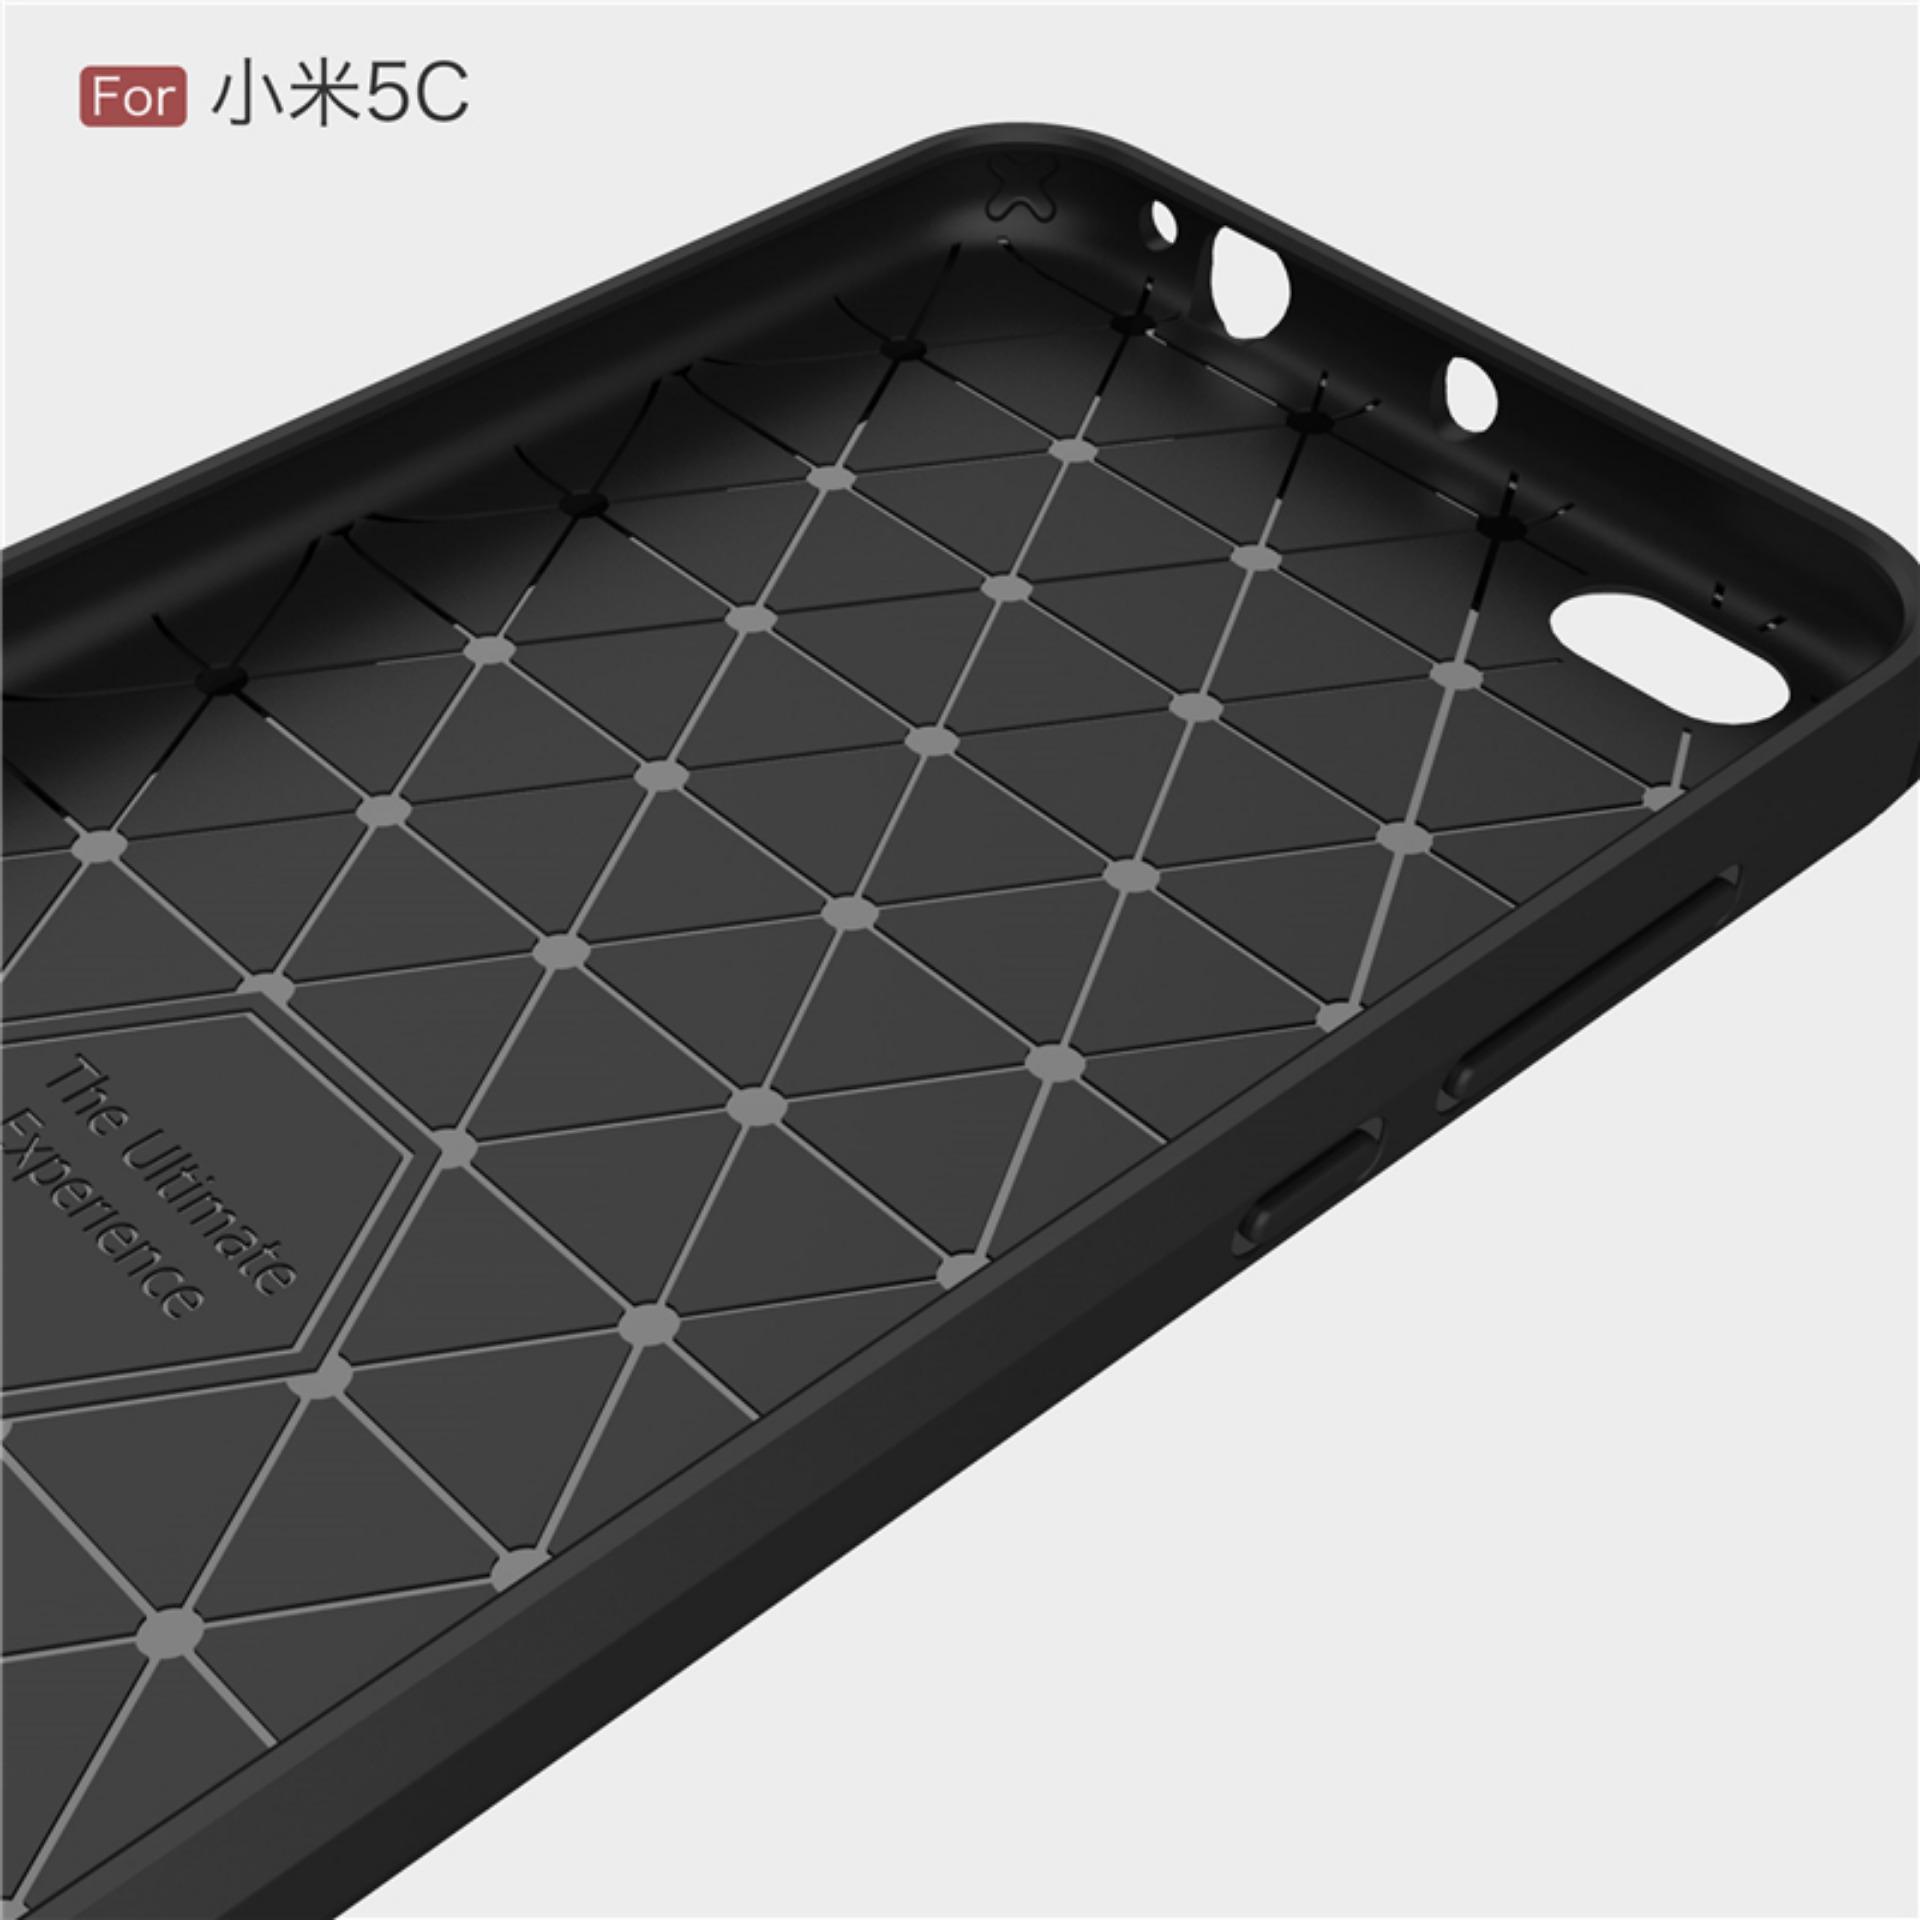 Renzana iPaky Carbon Fiber Shockproof Hybrid Back Case for Xiaomi Mi 5c /